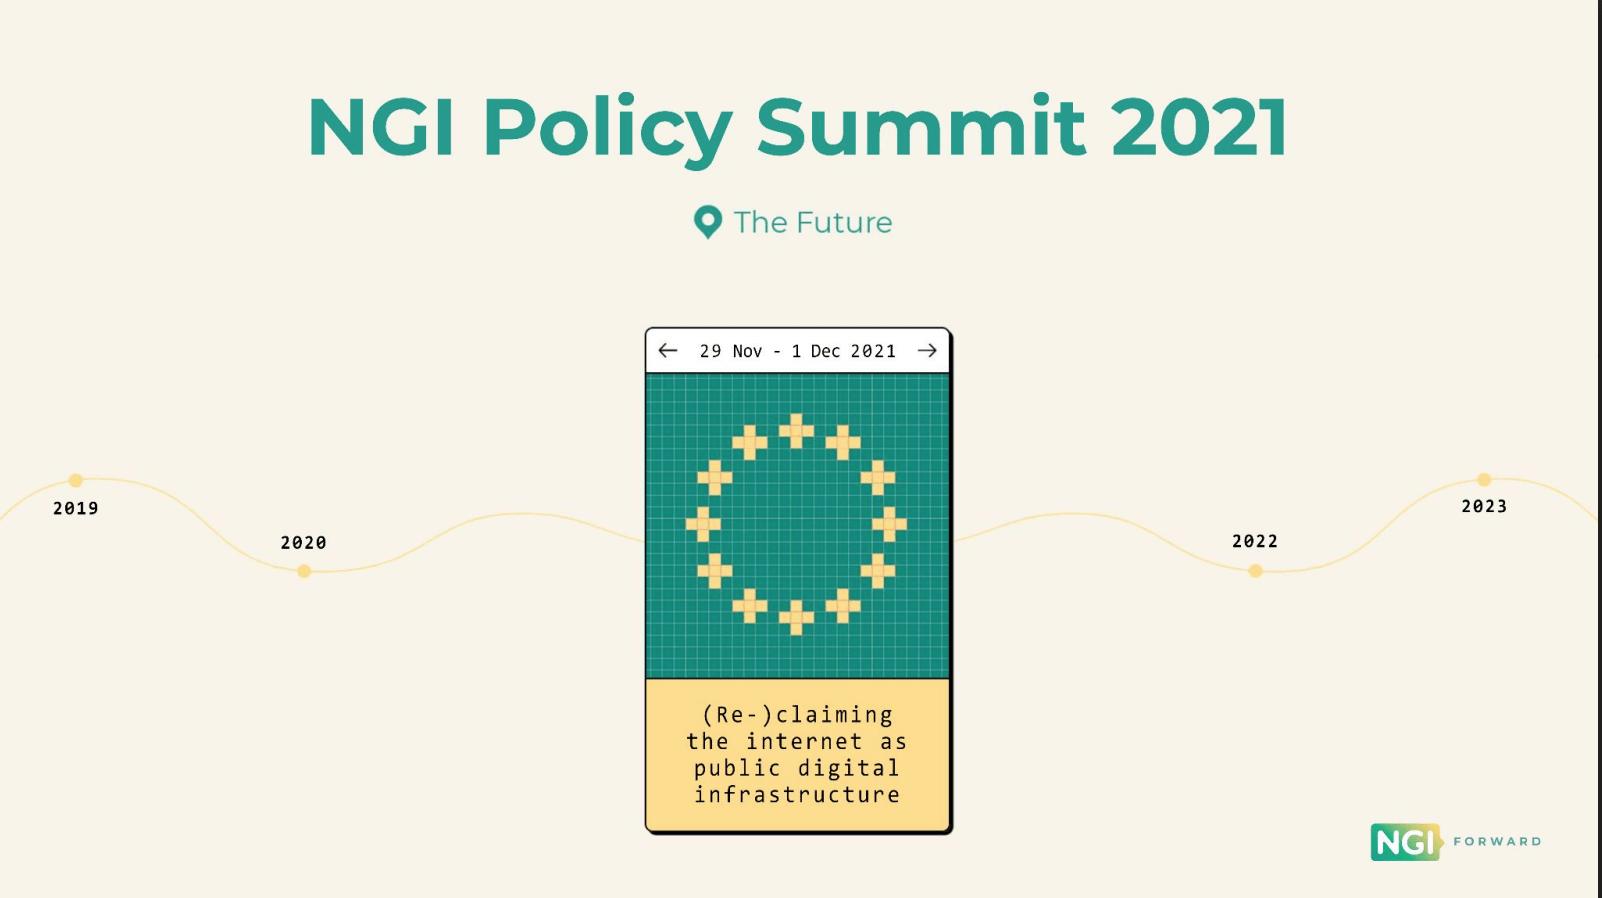 NGI Policy Summit 2021